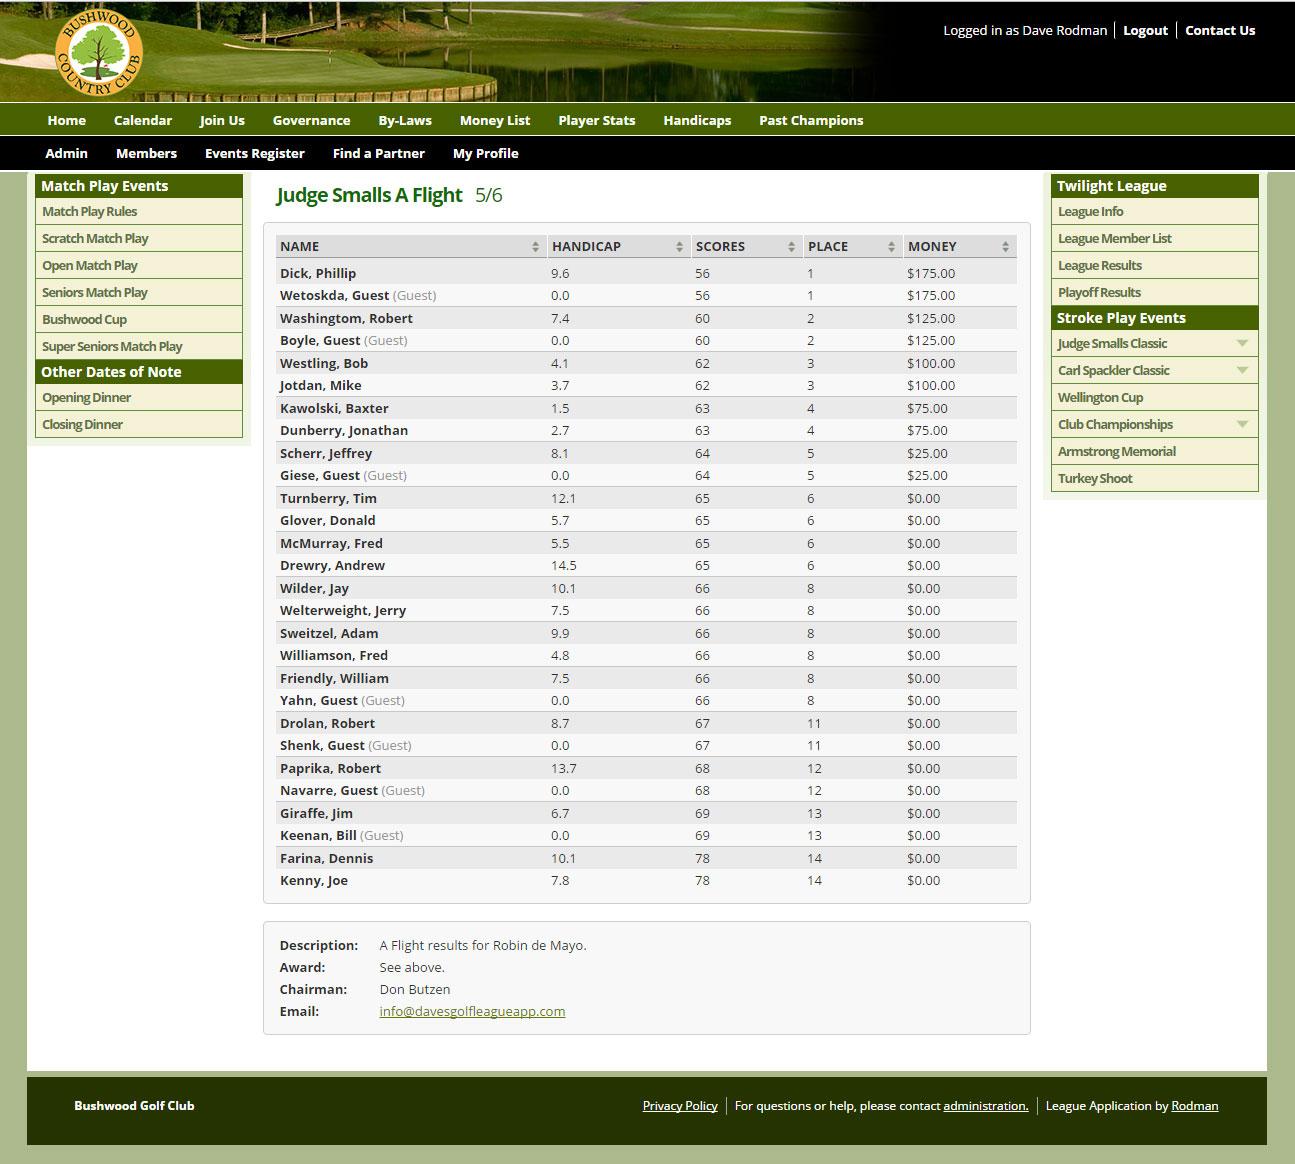 Tournament Scores